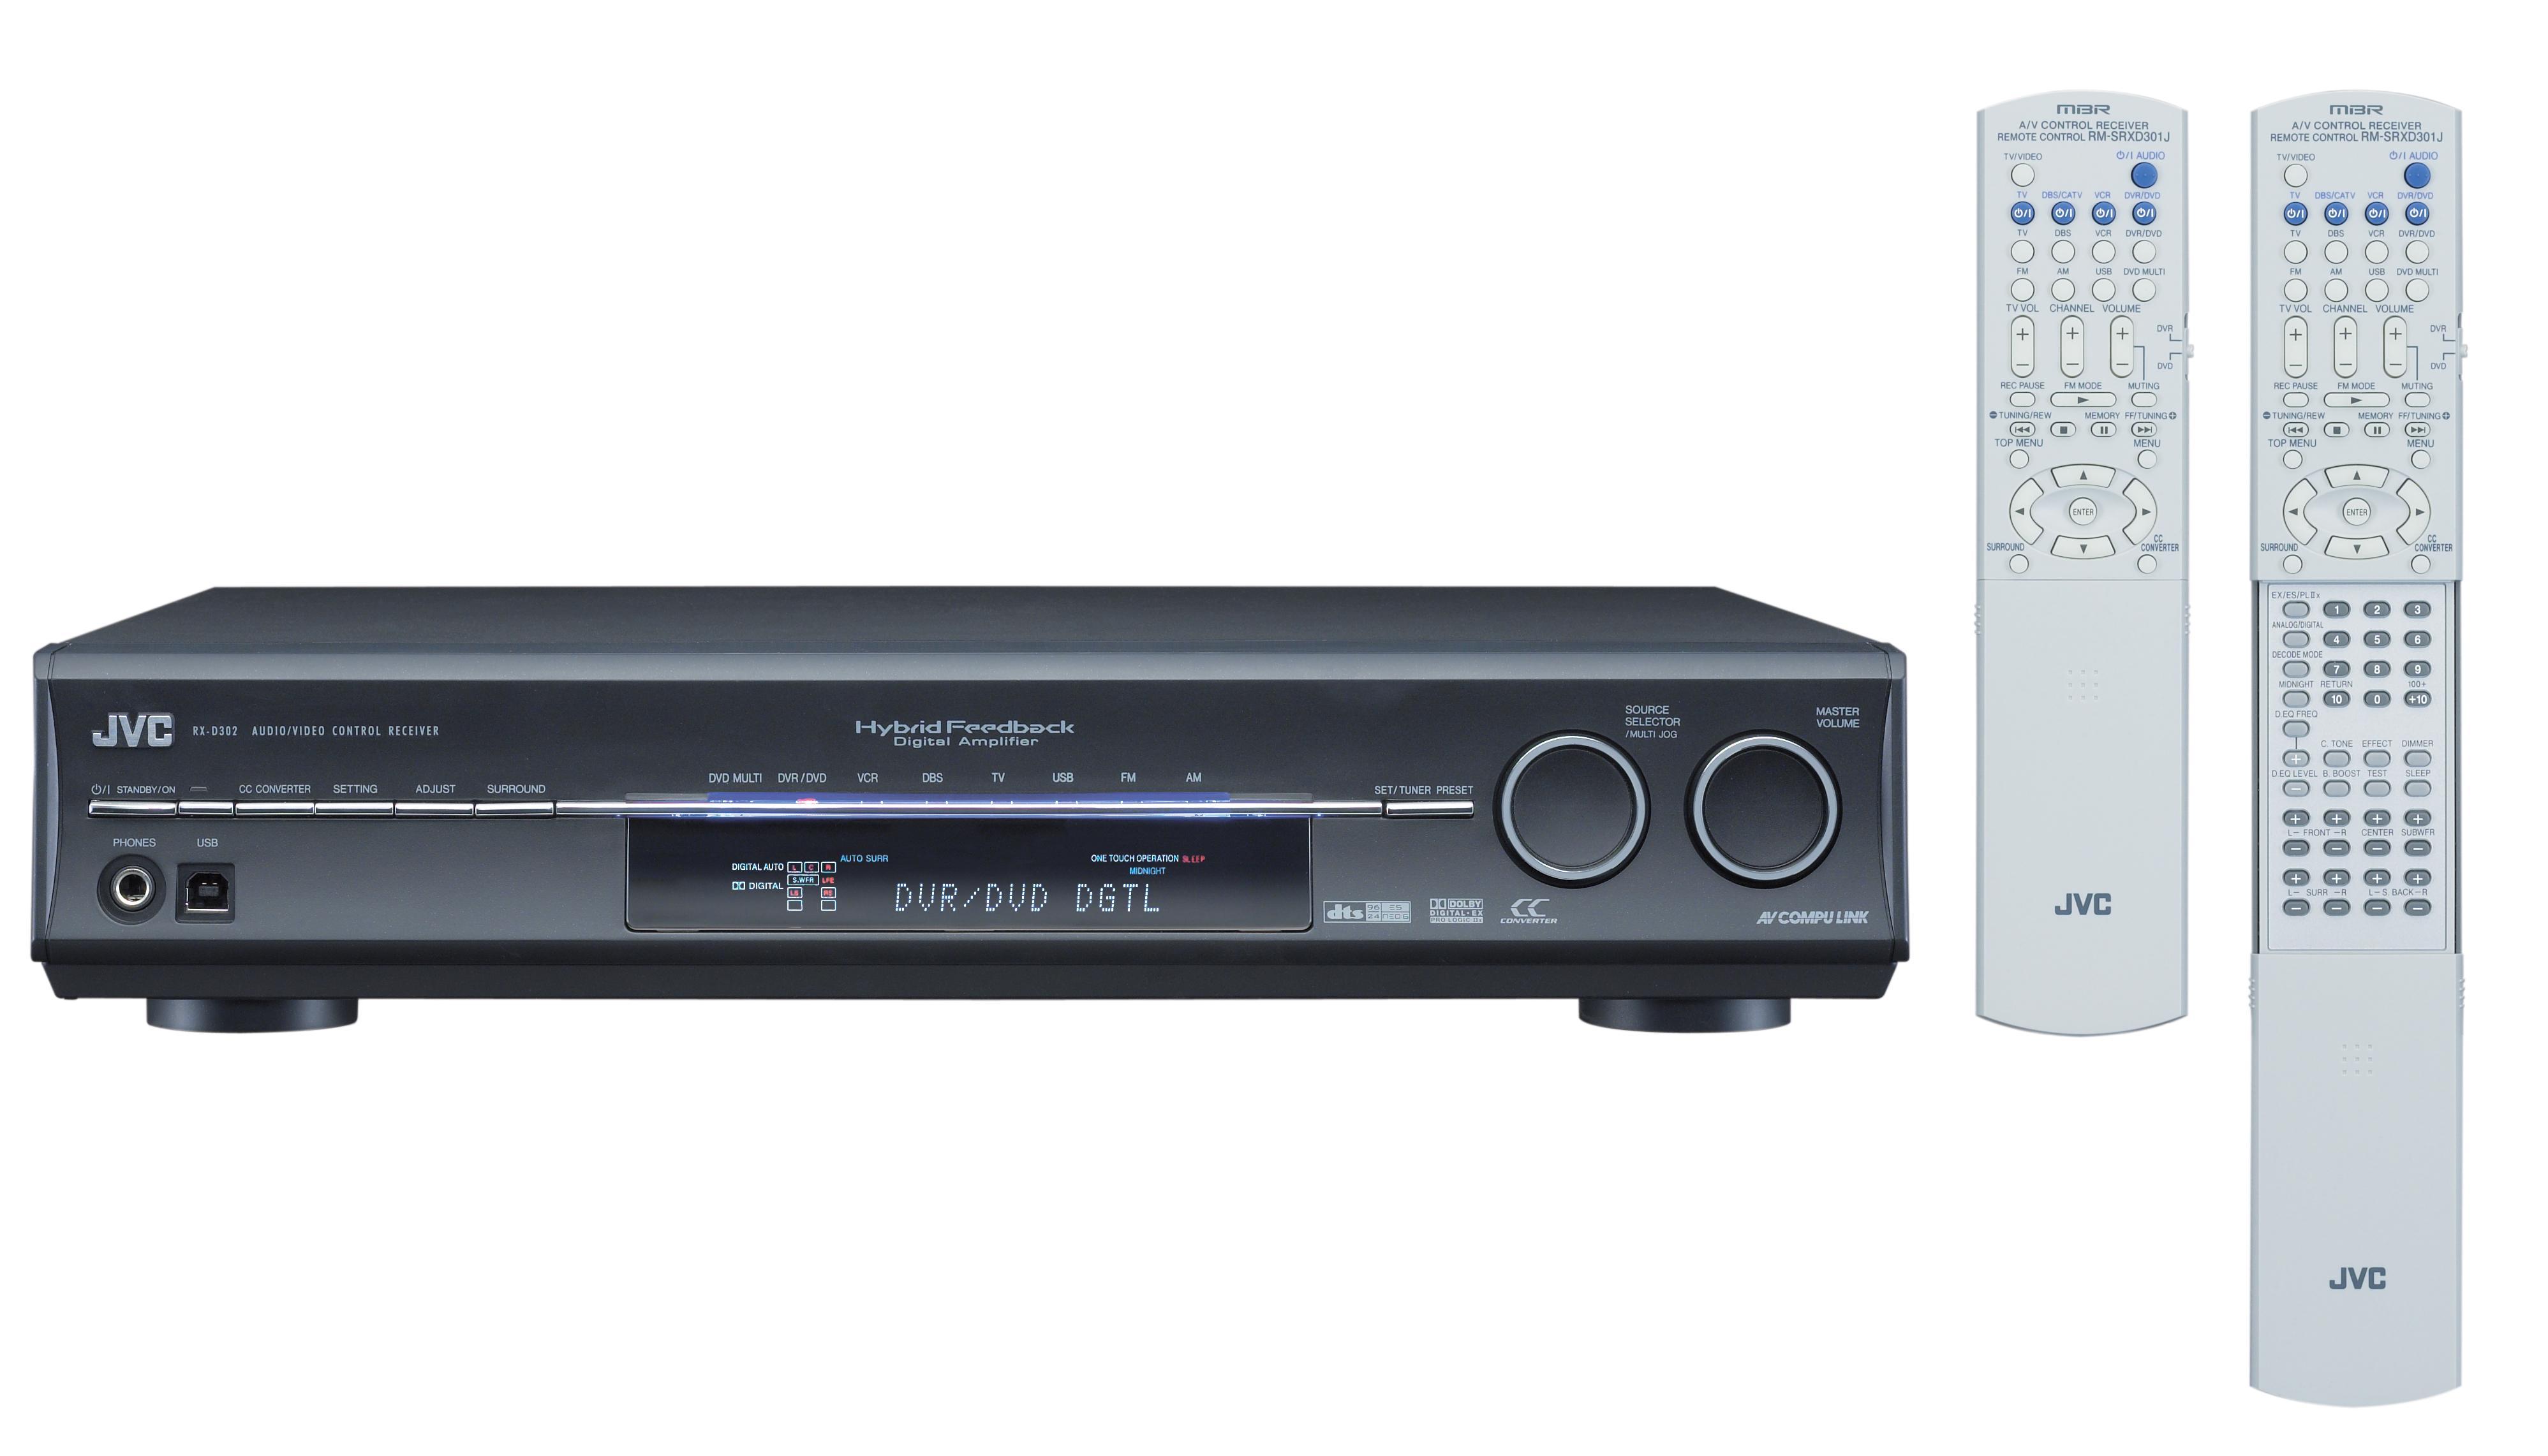 JVC RX-D302B 110W per Channel A/V Control Receiver (Refurbished) - Thumbnail 1